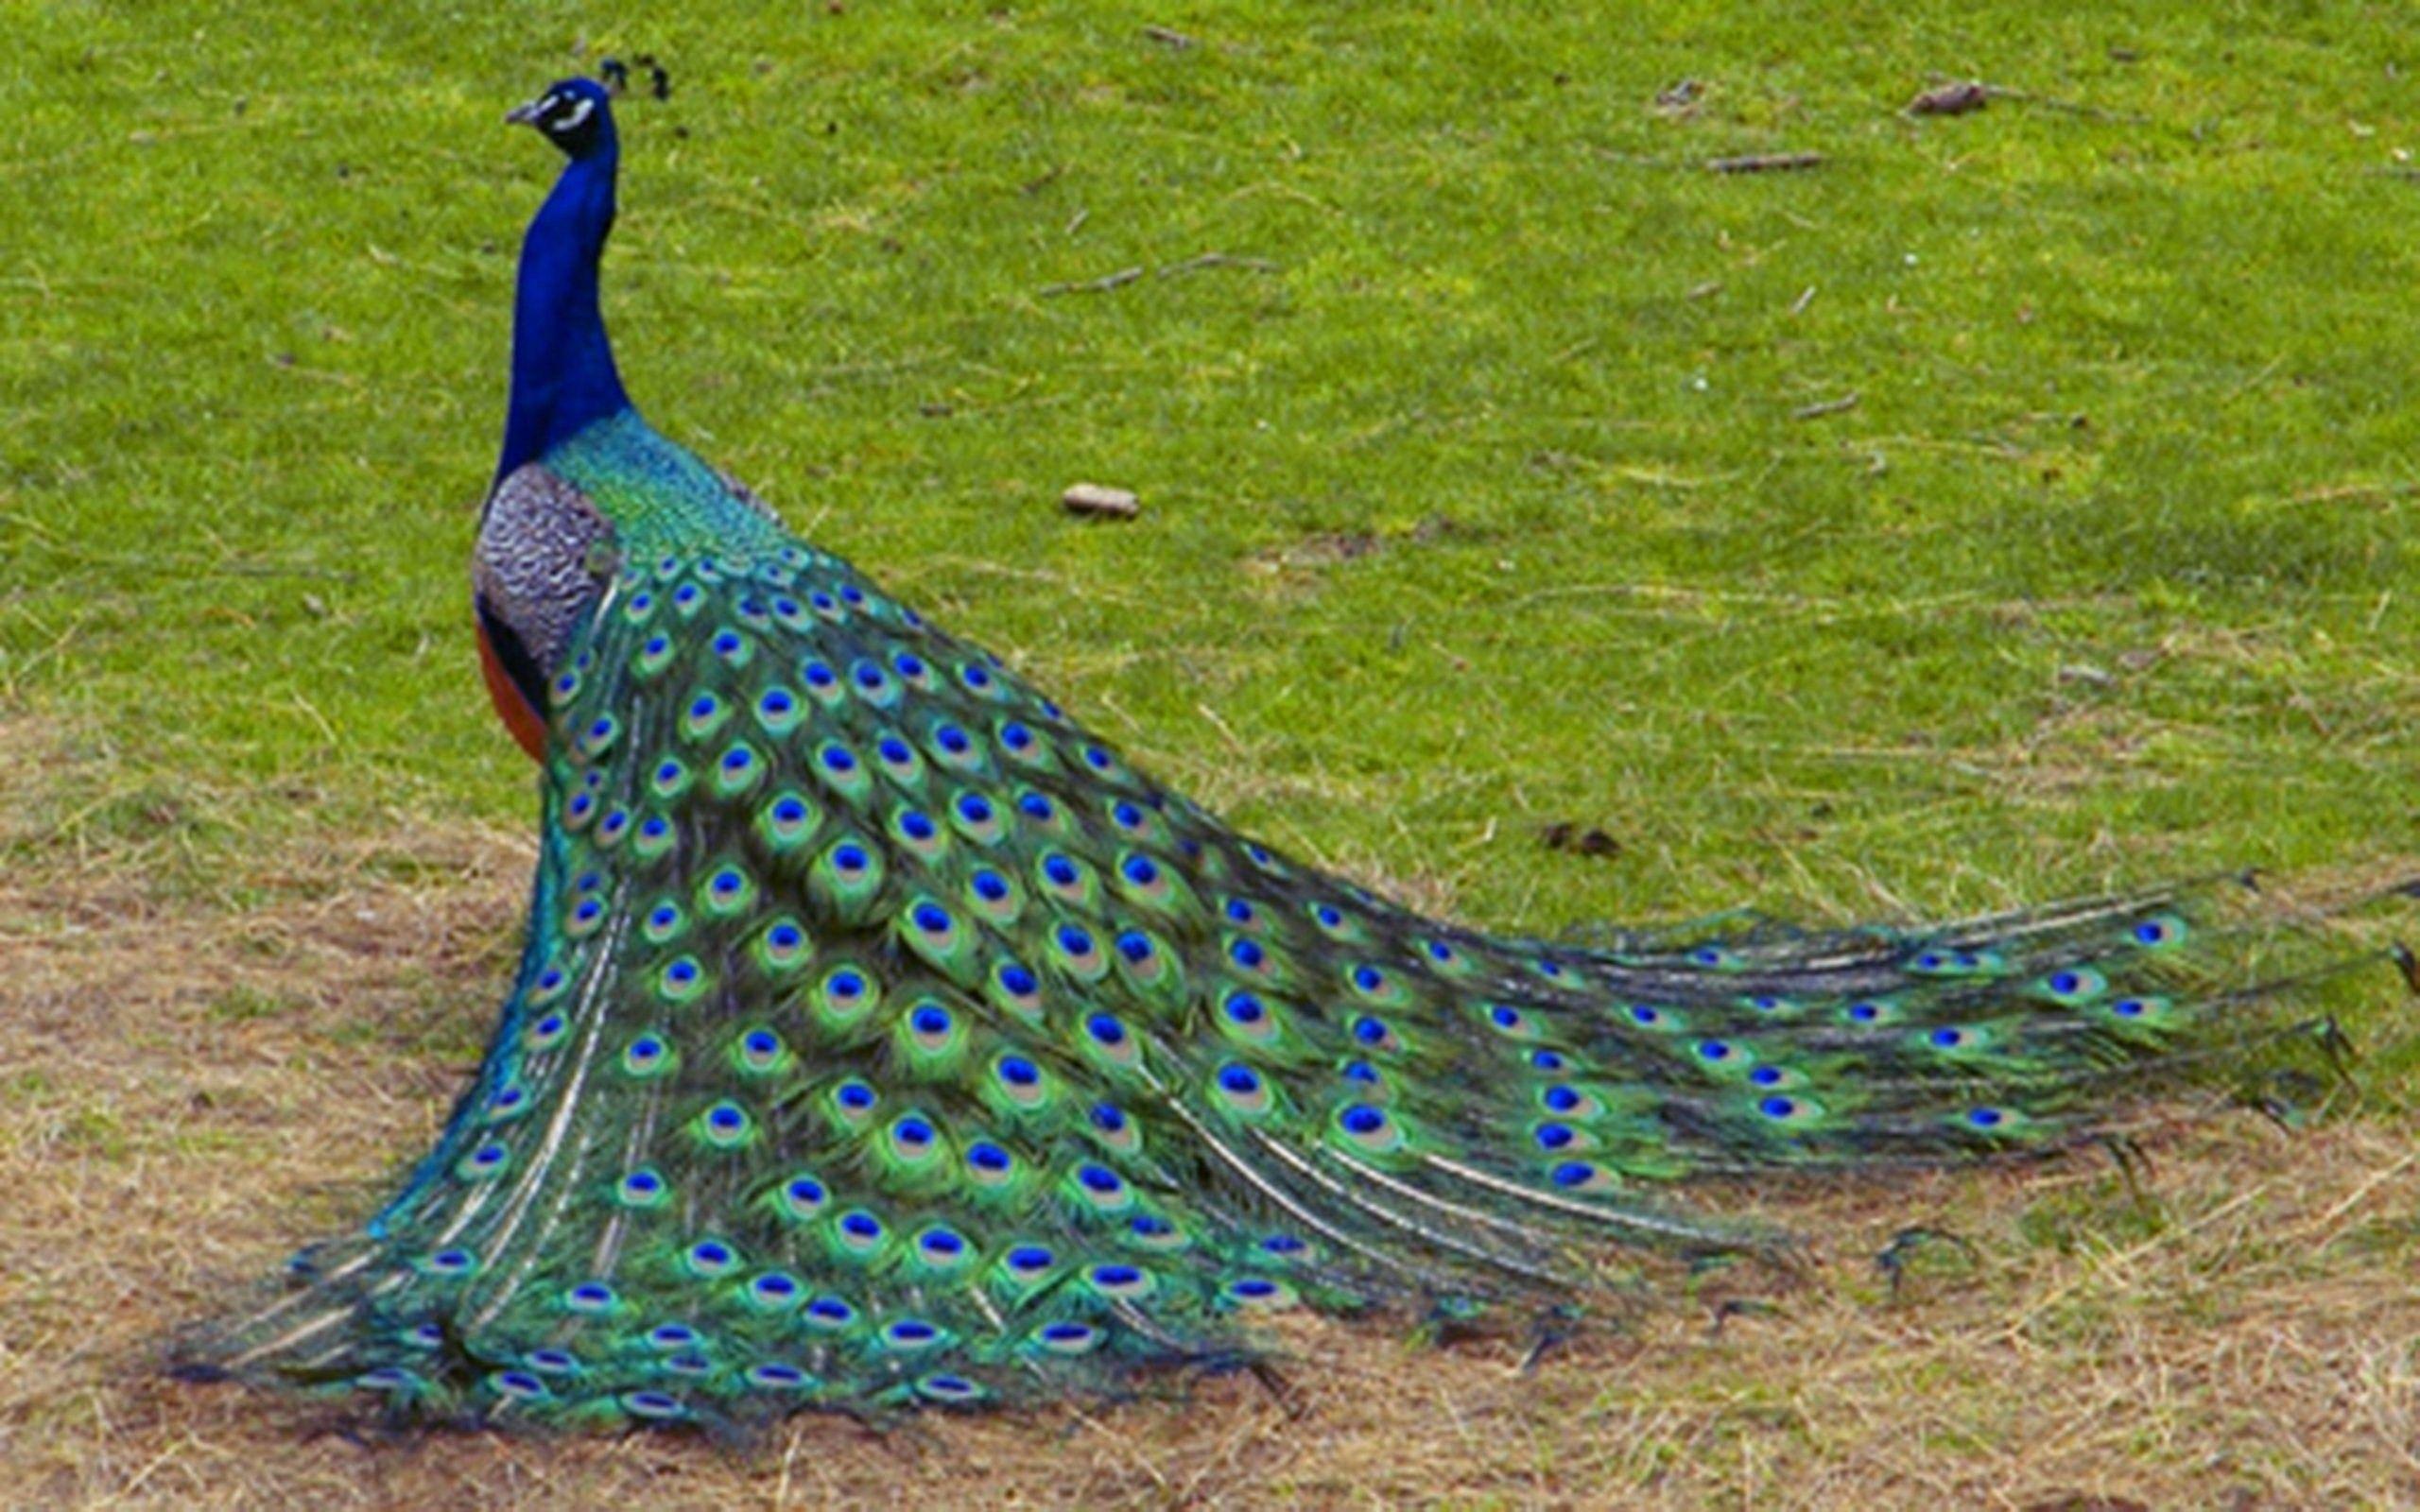 peacock hd wallpapers 1080p